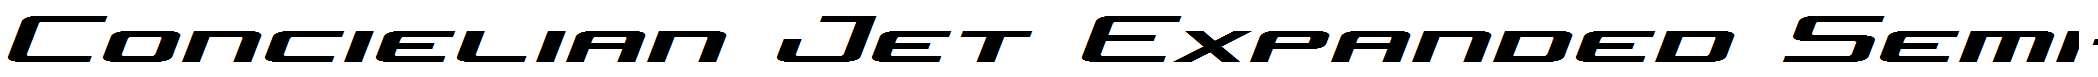 Concielian-Jet-Expanded-Semi-Italic-copy-1-